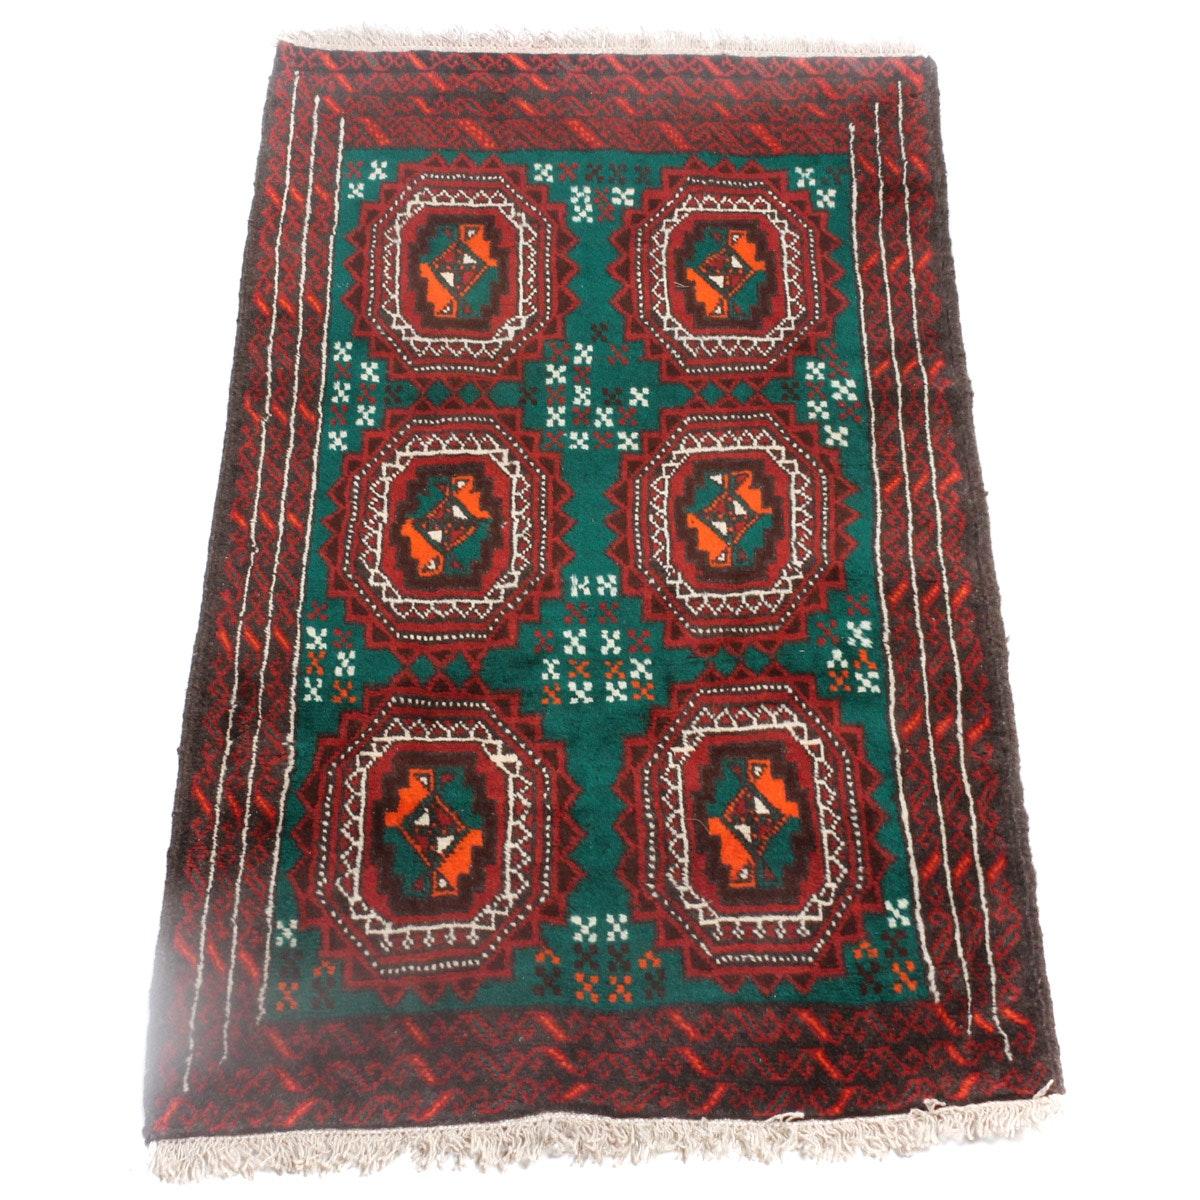 Hand-Knotted Persian Qashqai Rug